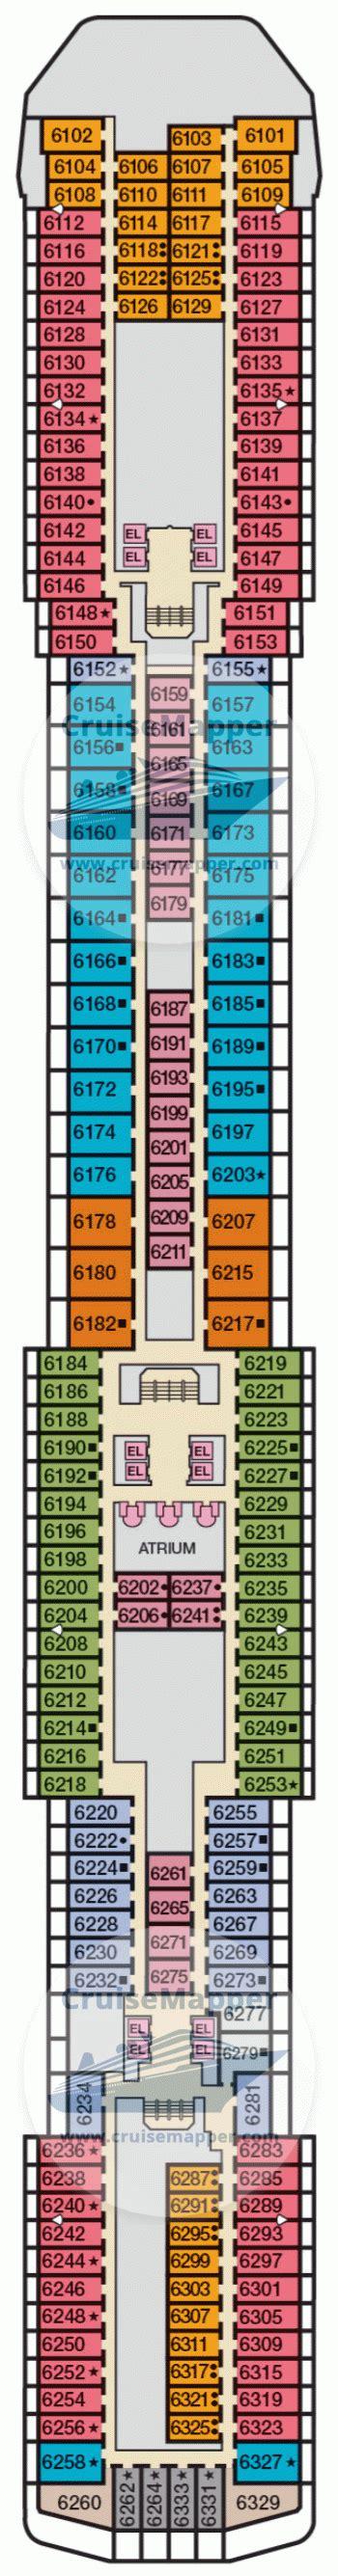 carnival pride floor plan carnival pride deck 6 plan cruisemapper